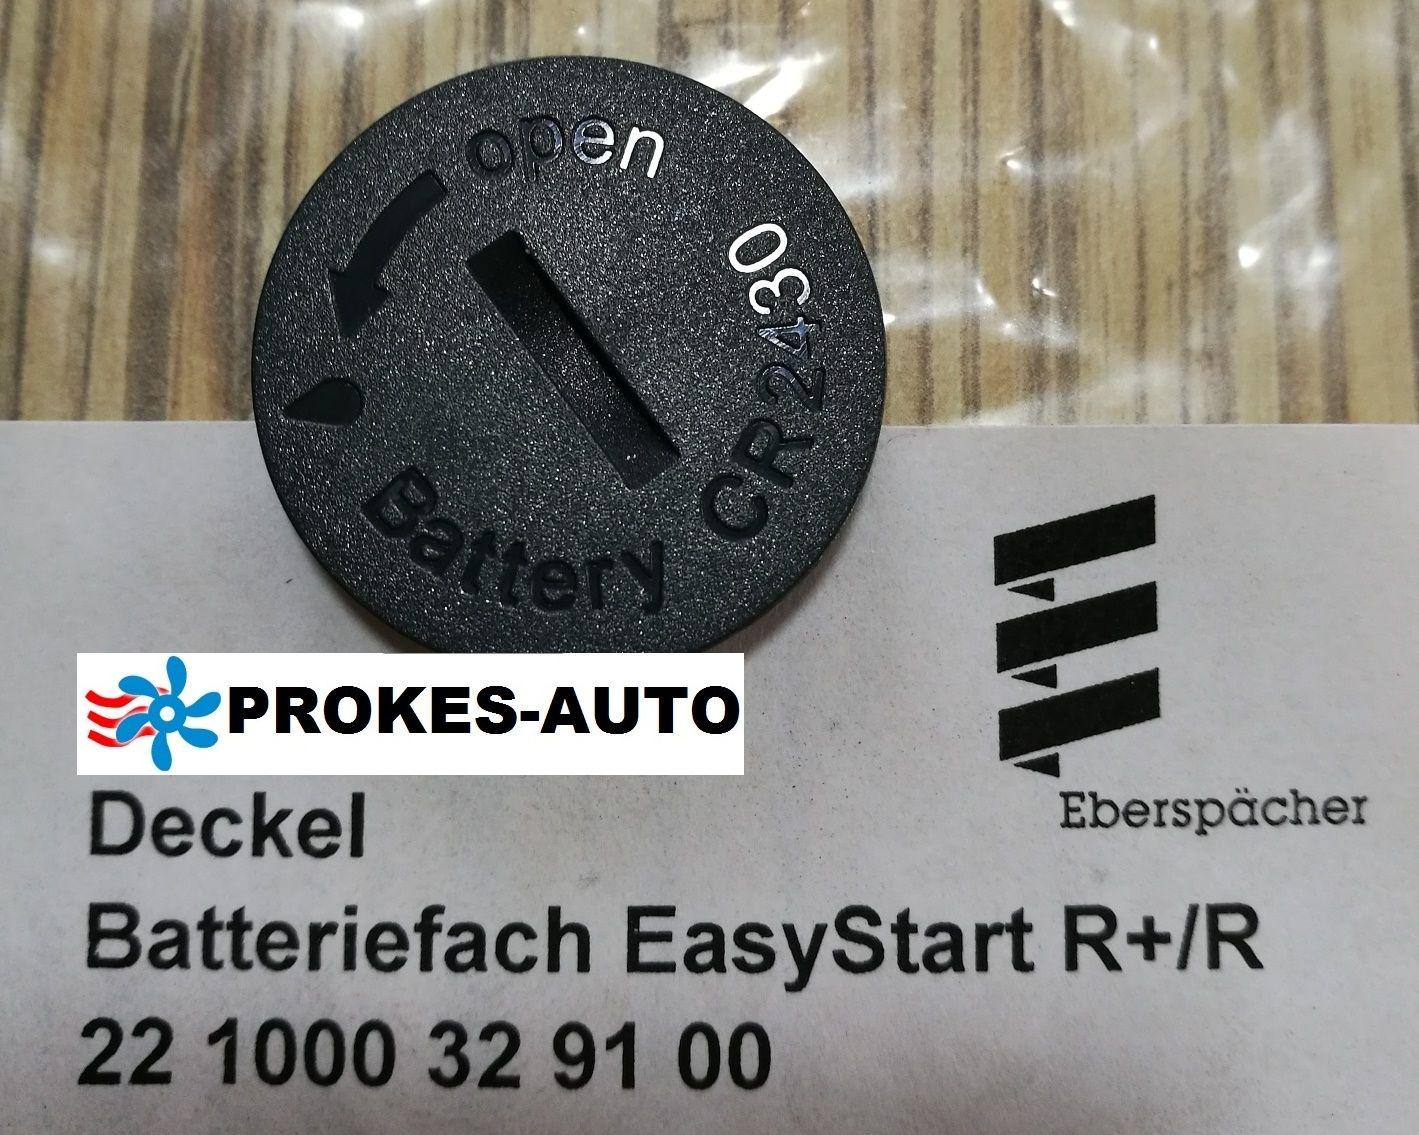 Kryt batérie diaľkového ovládania EasyStart R a R + 221000329100 Eberspächer